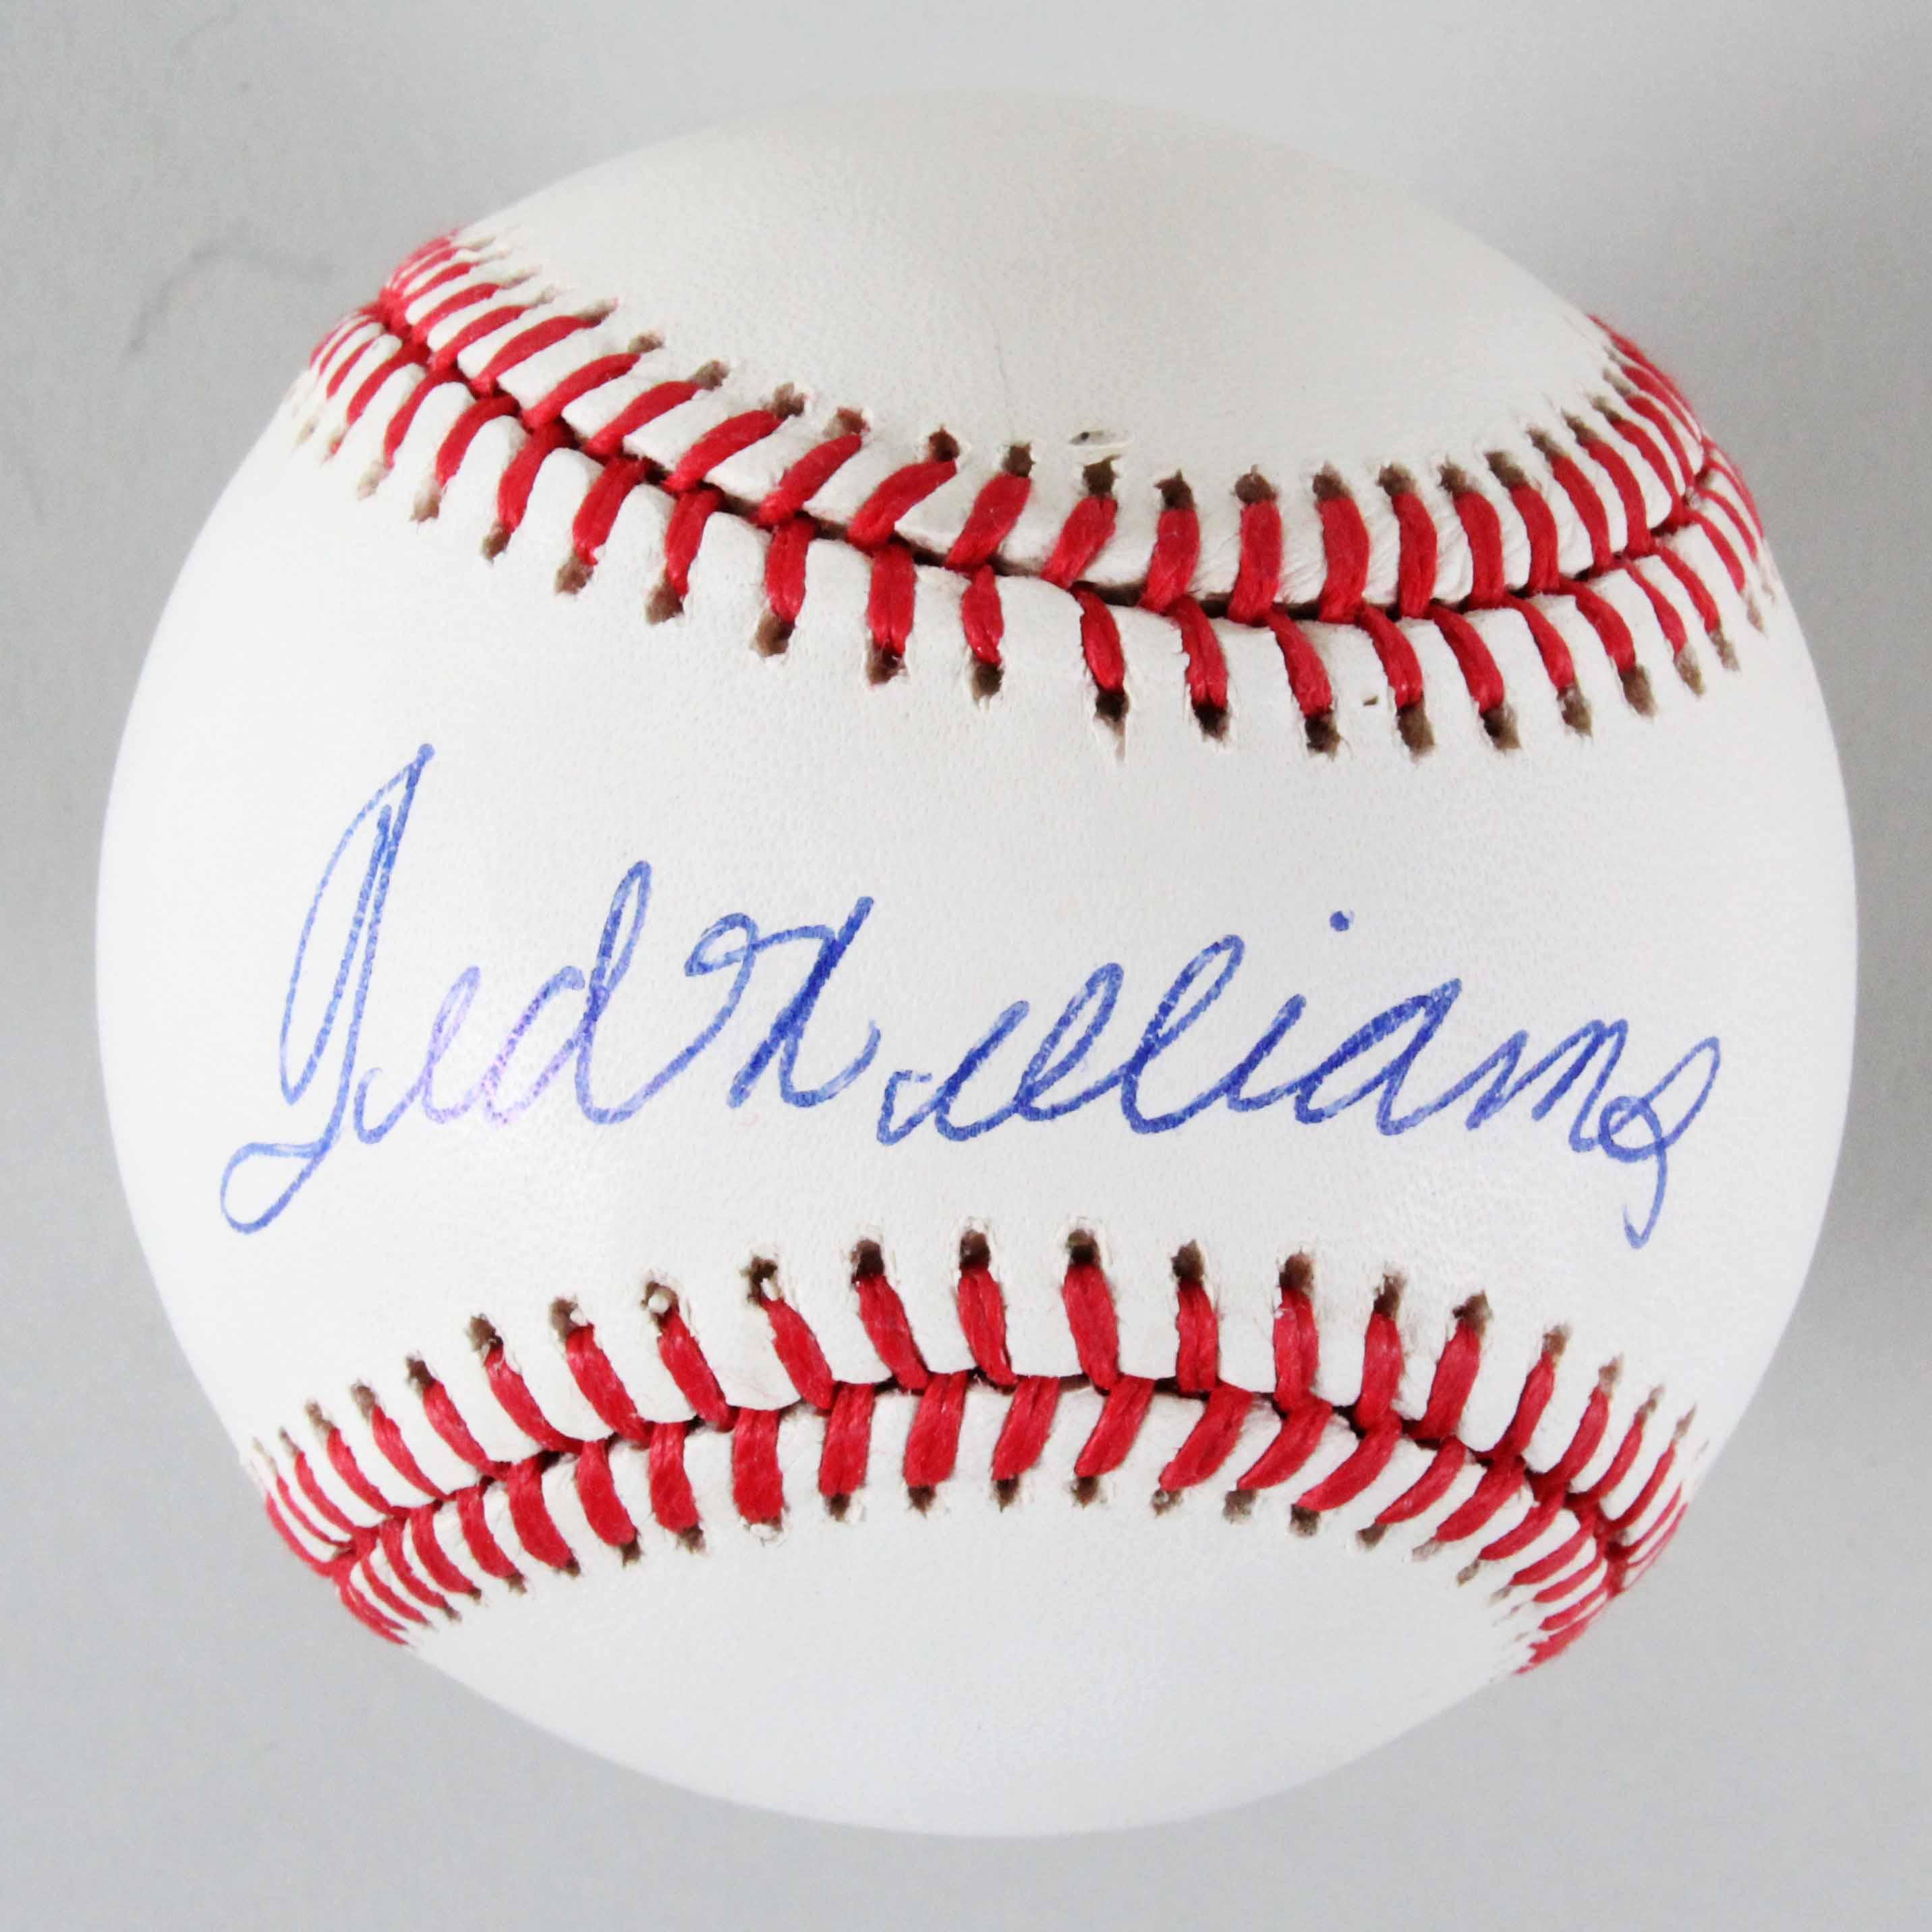 b7edbc2a4d7 Ted Williams Signed Baseball Red Sox – COA JSA